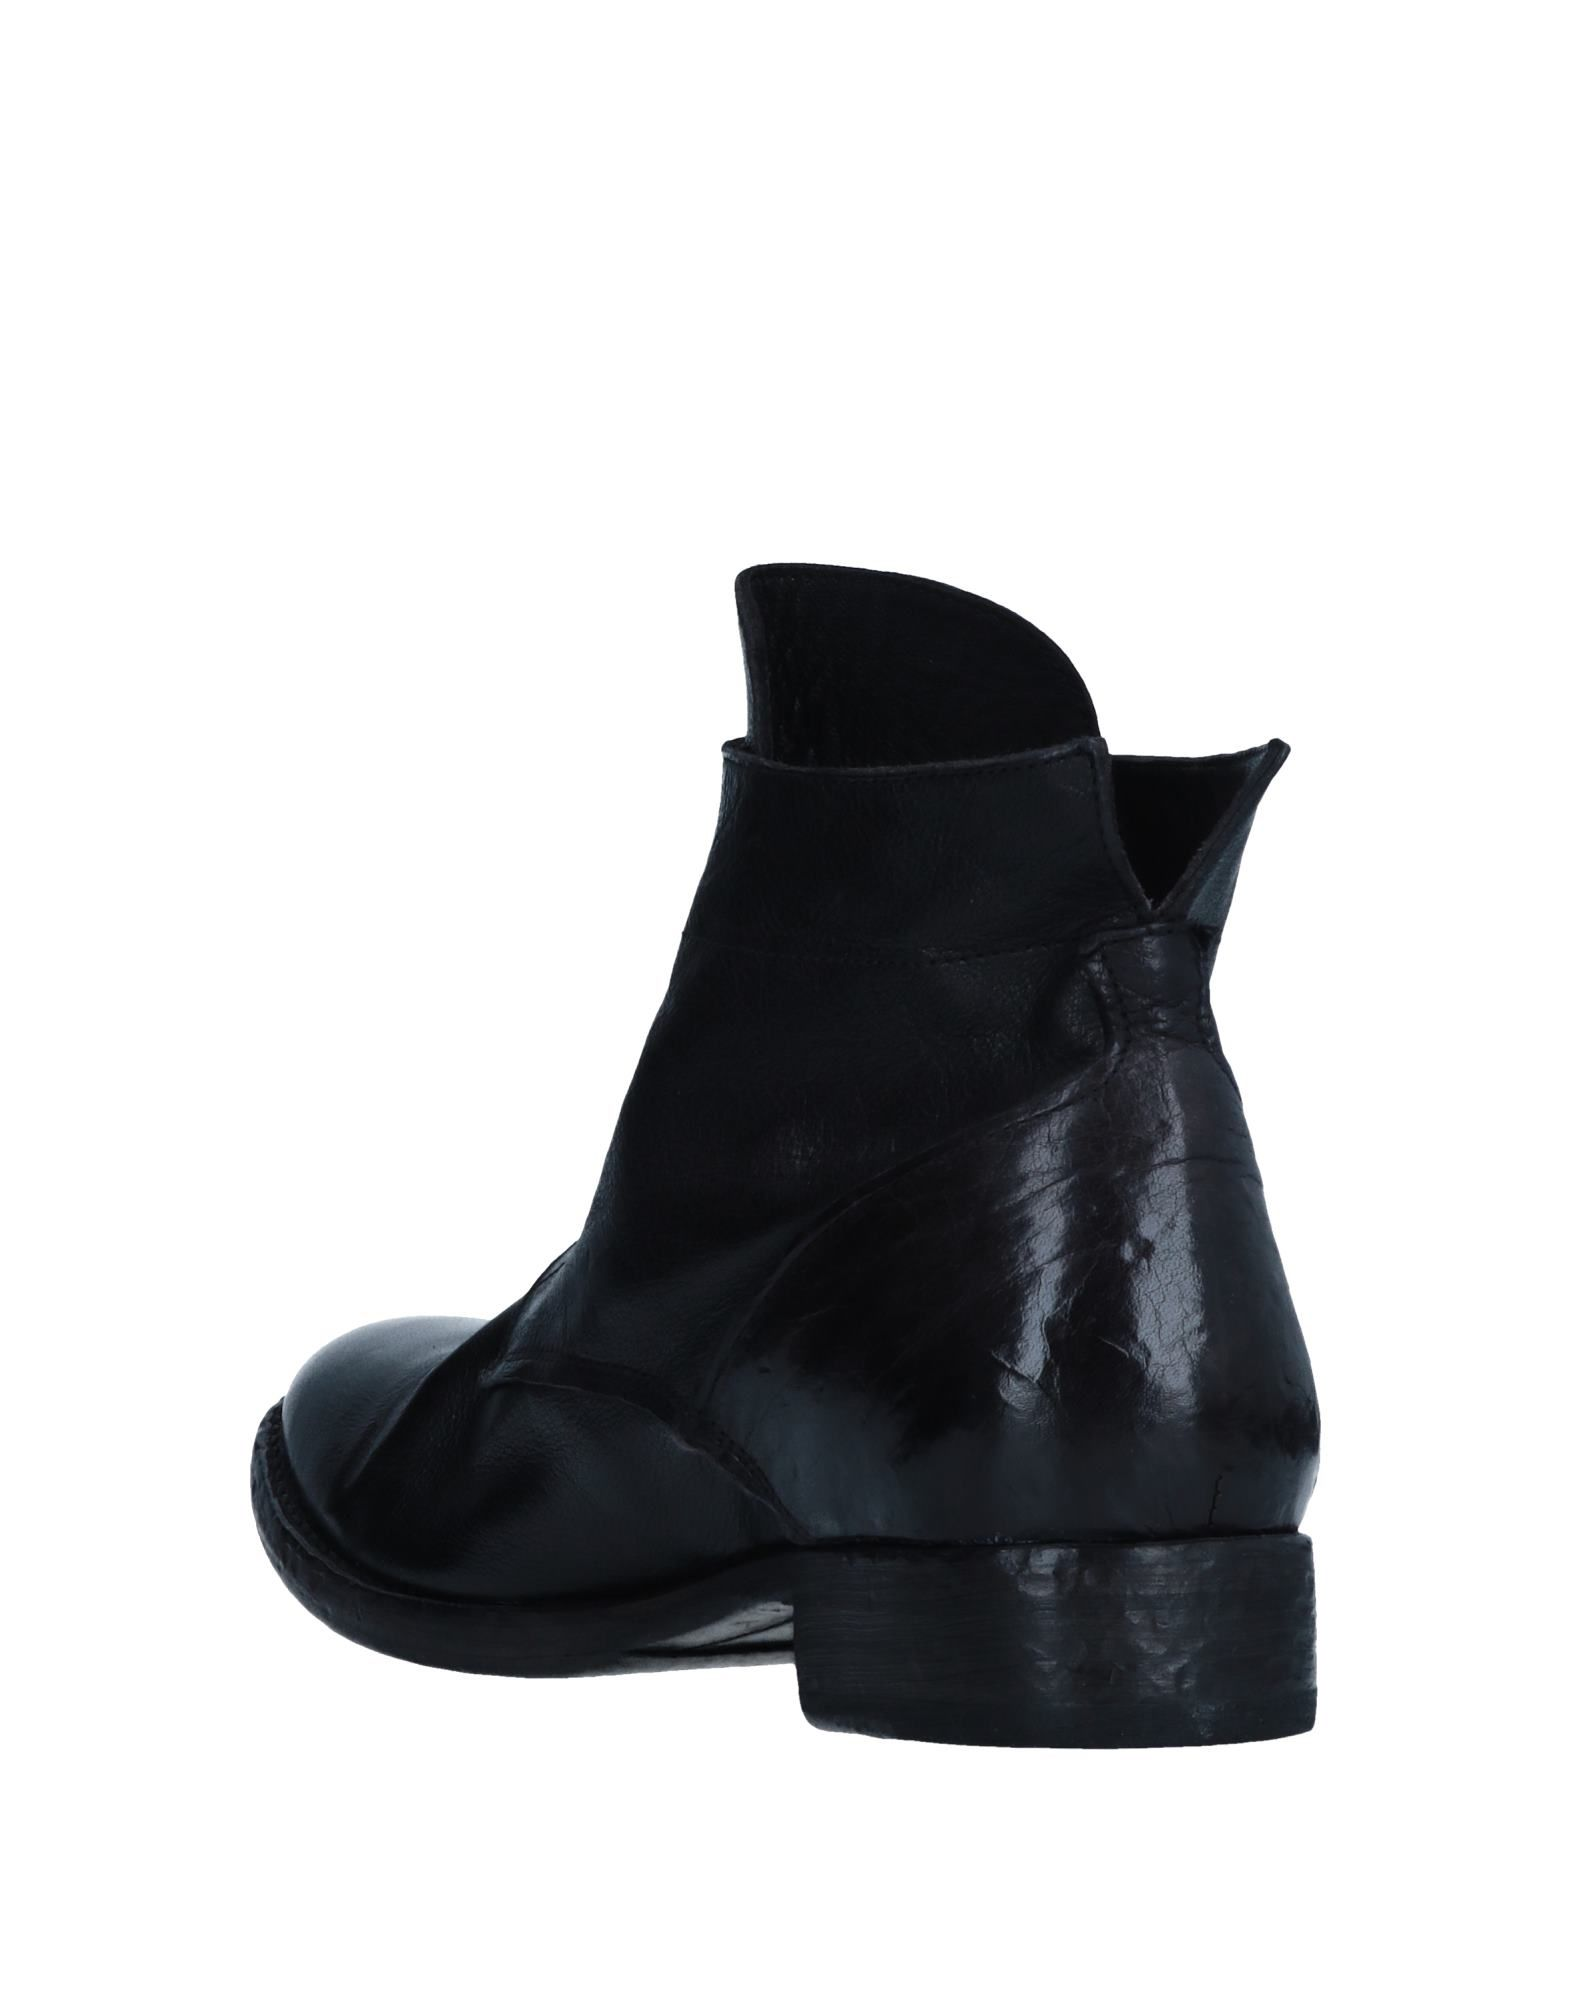 Open Closed   Shoes Stiefelette Herren  Closed 11554516UO Gute Qualität beliebte Schuhe deb252